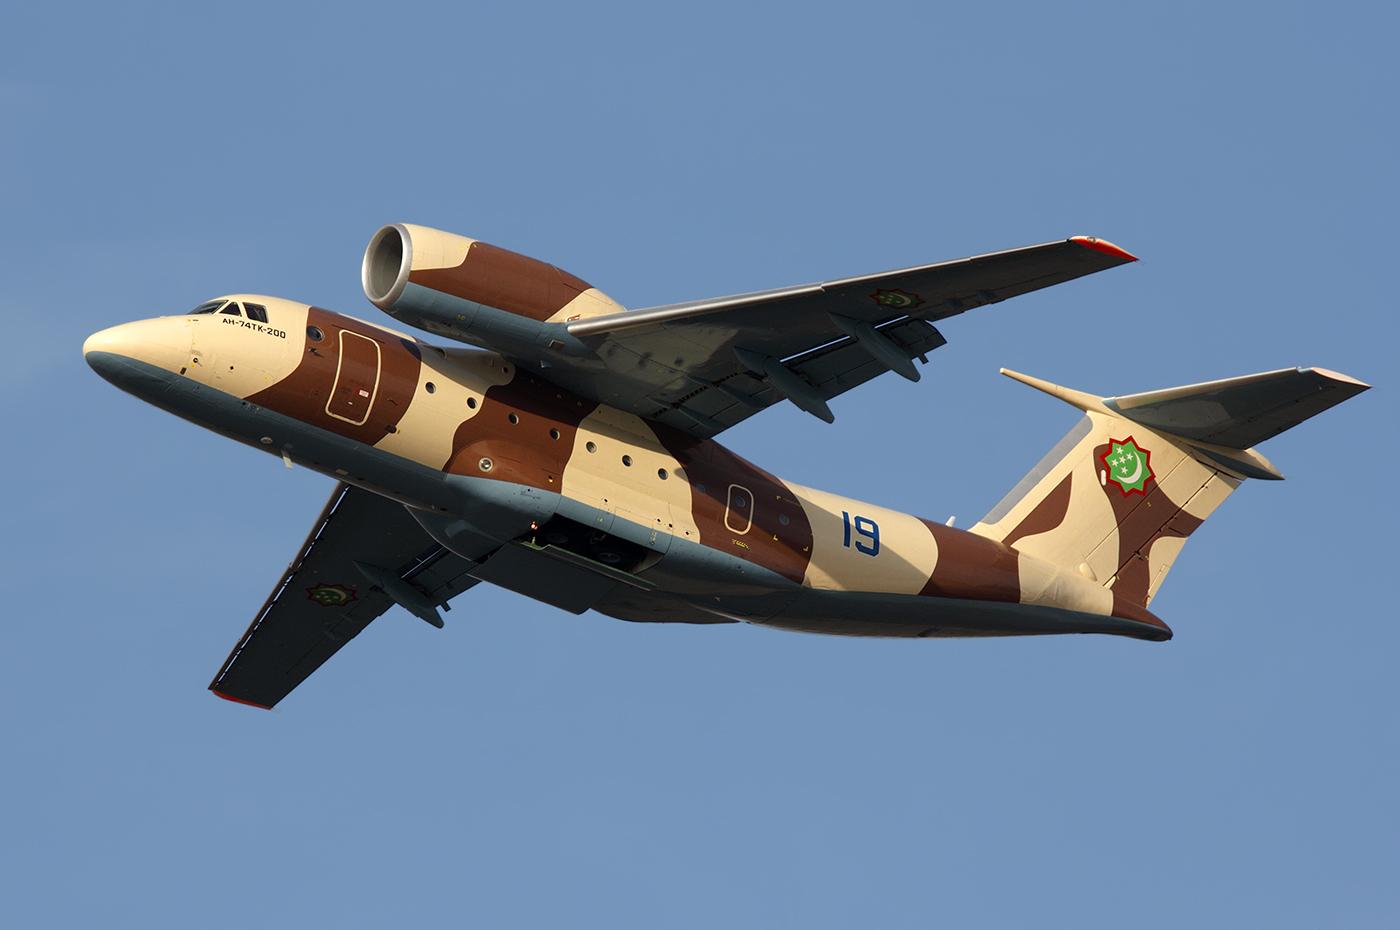 Turkmenistan_Air_Force_Antonov_An-74TK-200_at_Kharkiv_Airport.jpeg